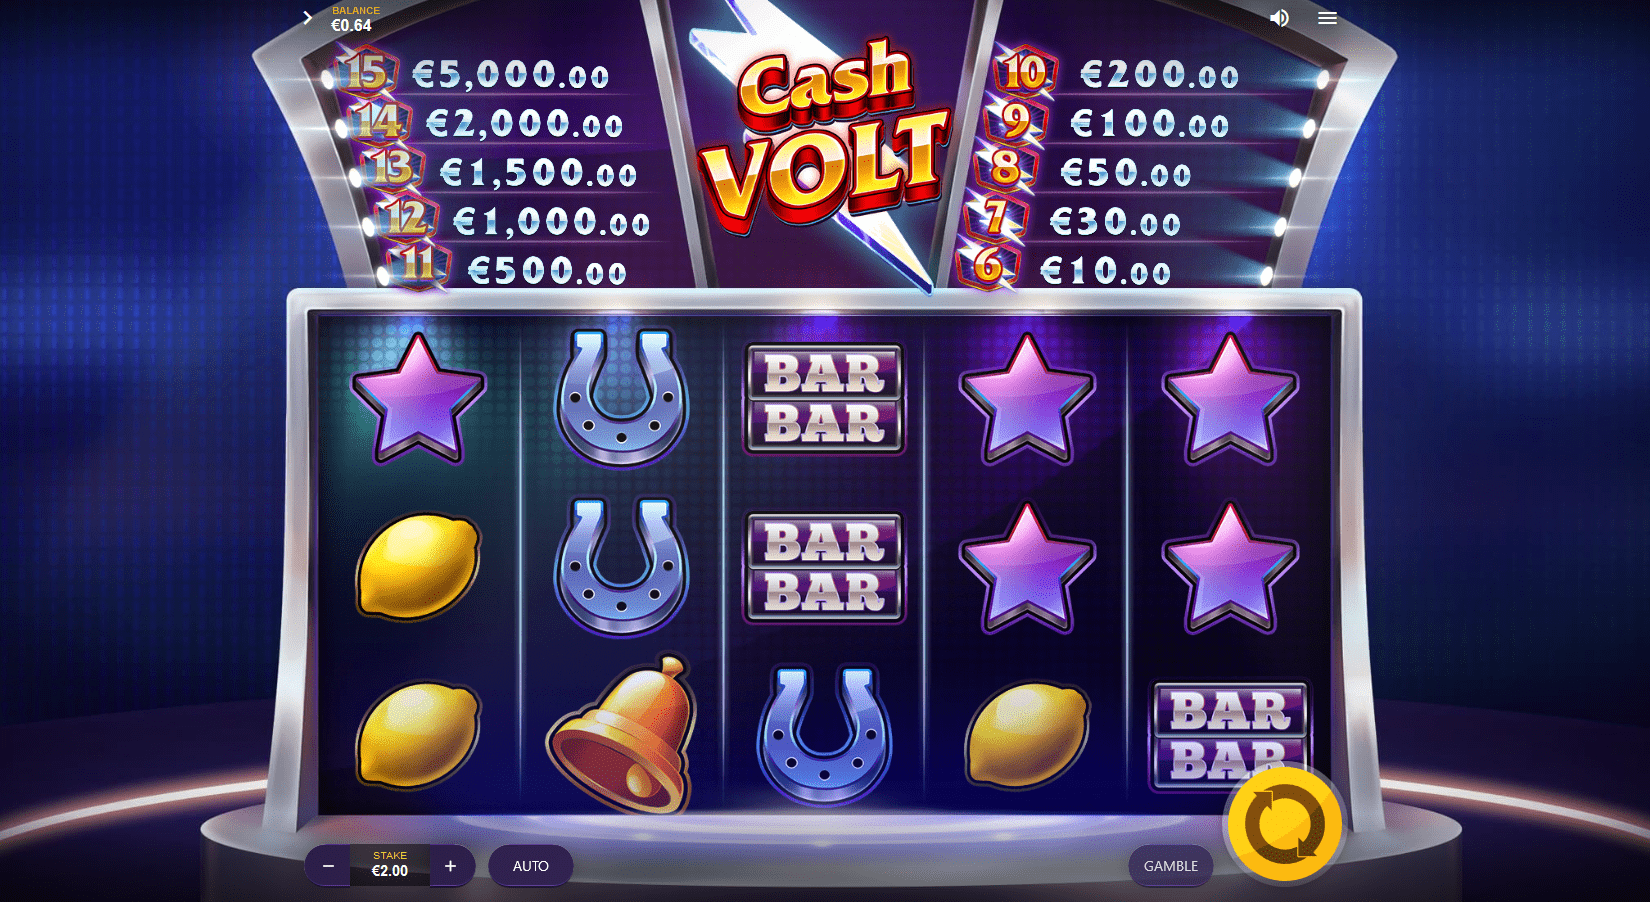 Cash Volt Slot Game